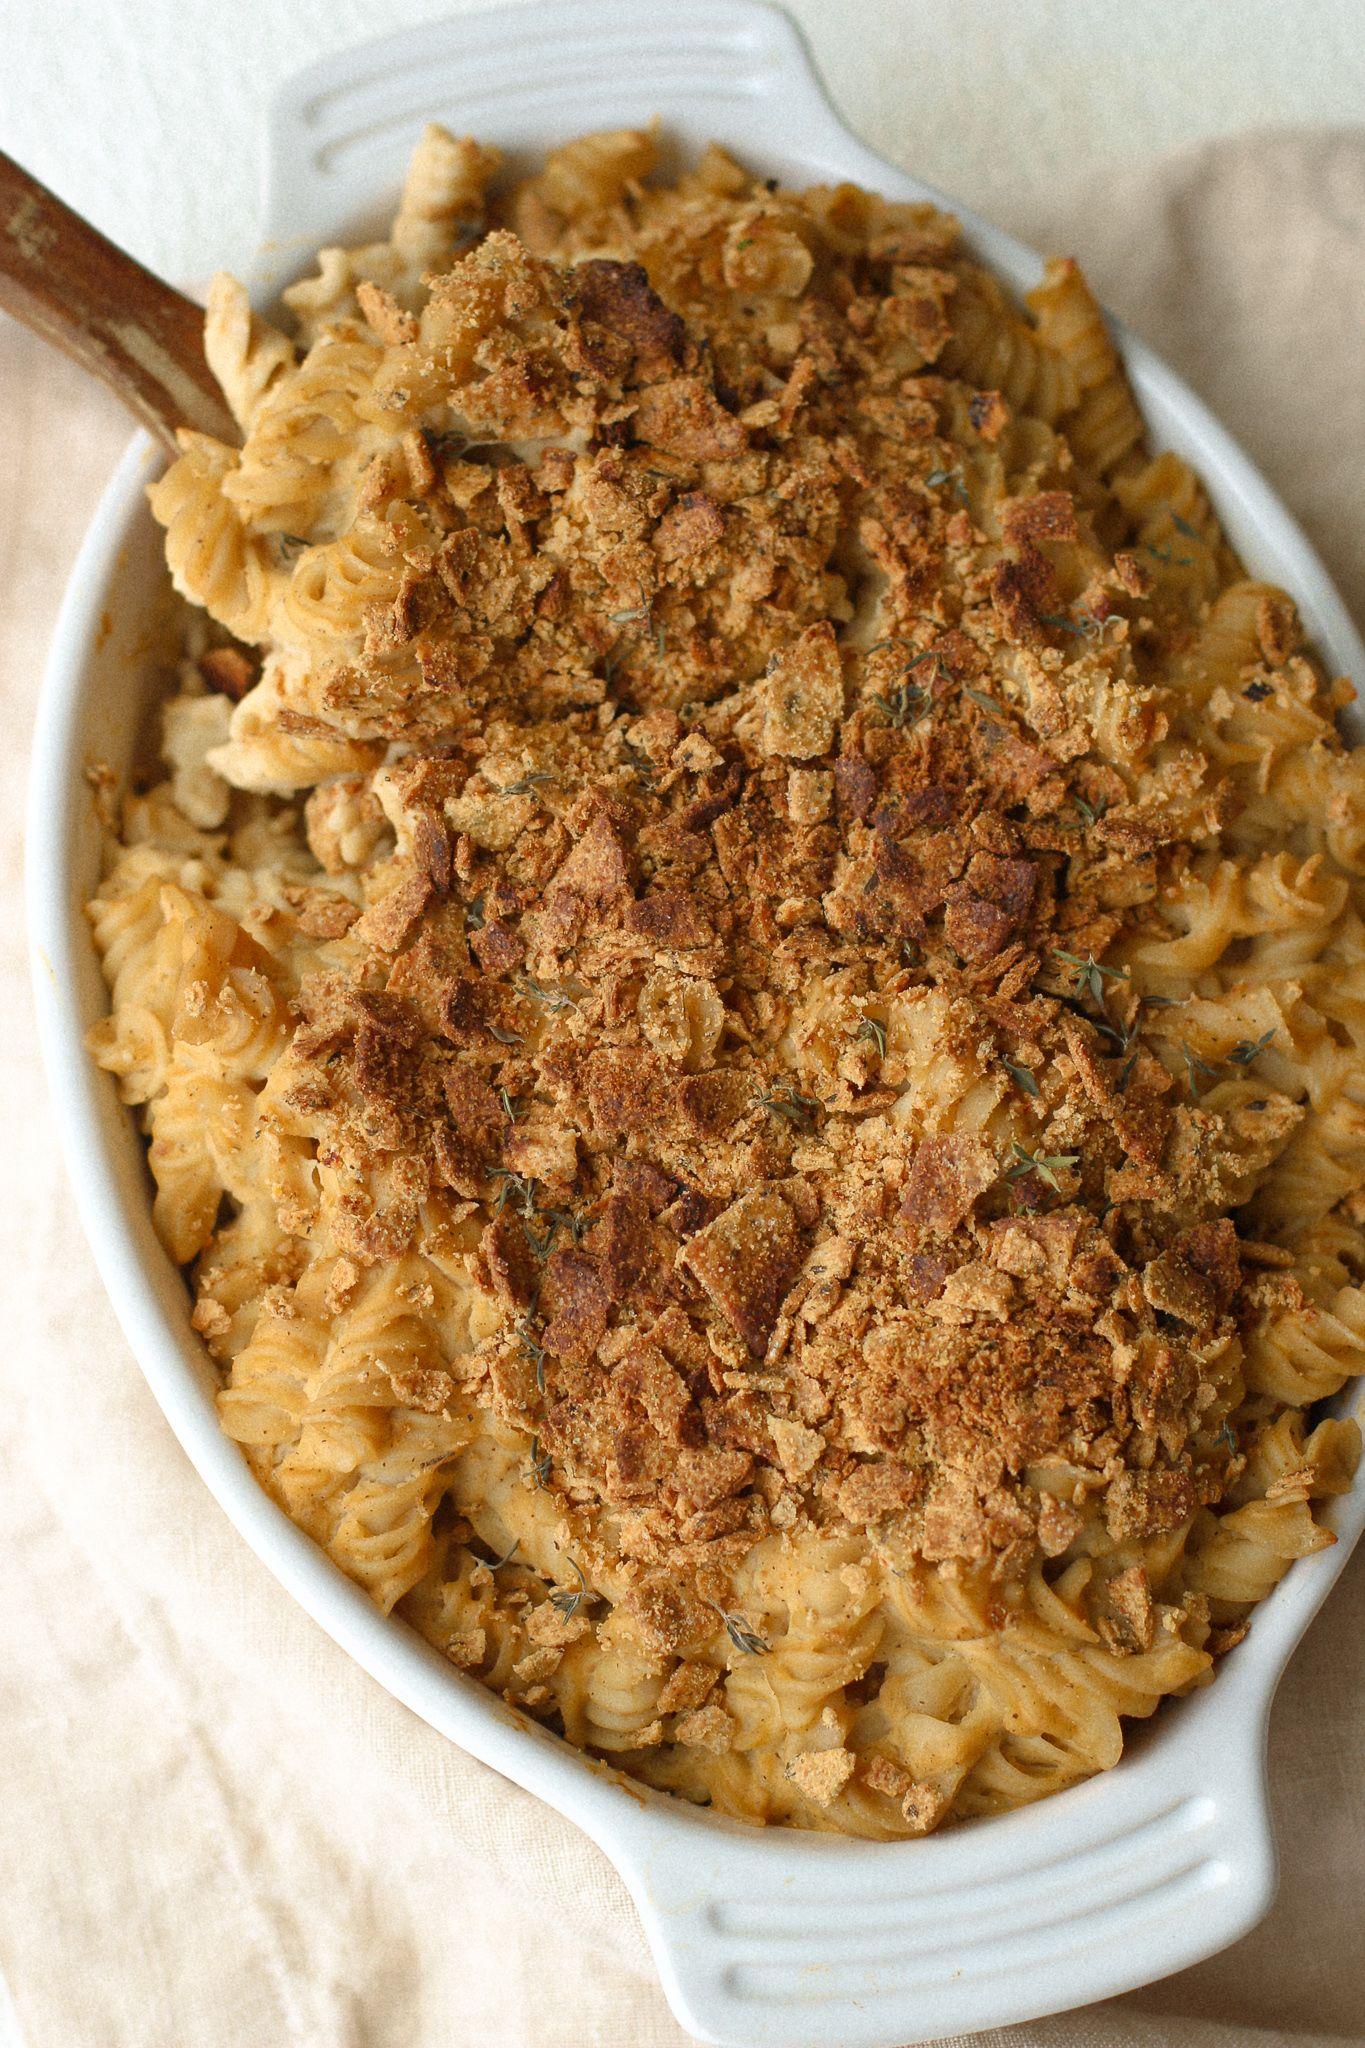 Healthy Baked Cauliflower Mac And Cheese Vegan Gluten Free Recipe In 2020 Cauliflower Mac And Cheese Baked Cauliflower Healthy Baking